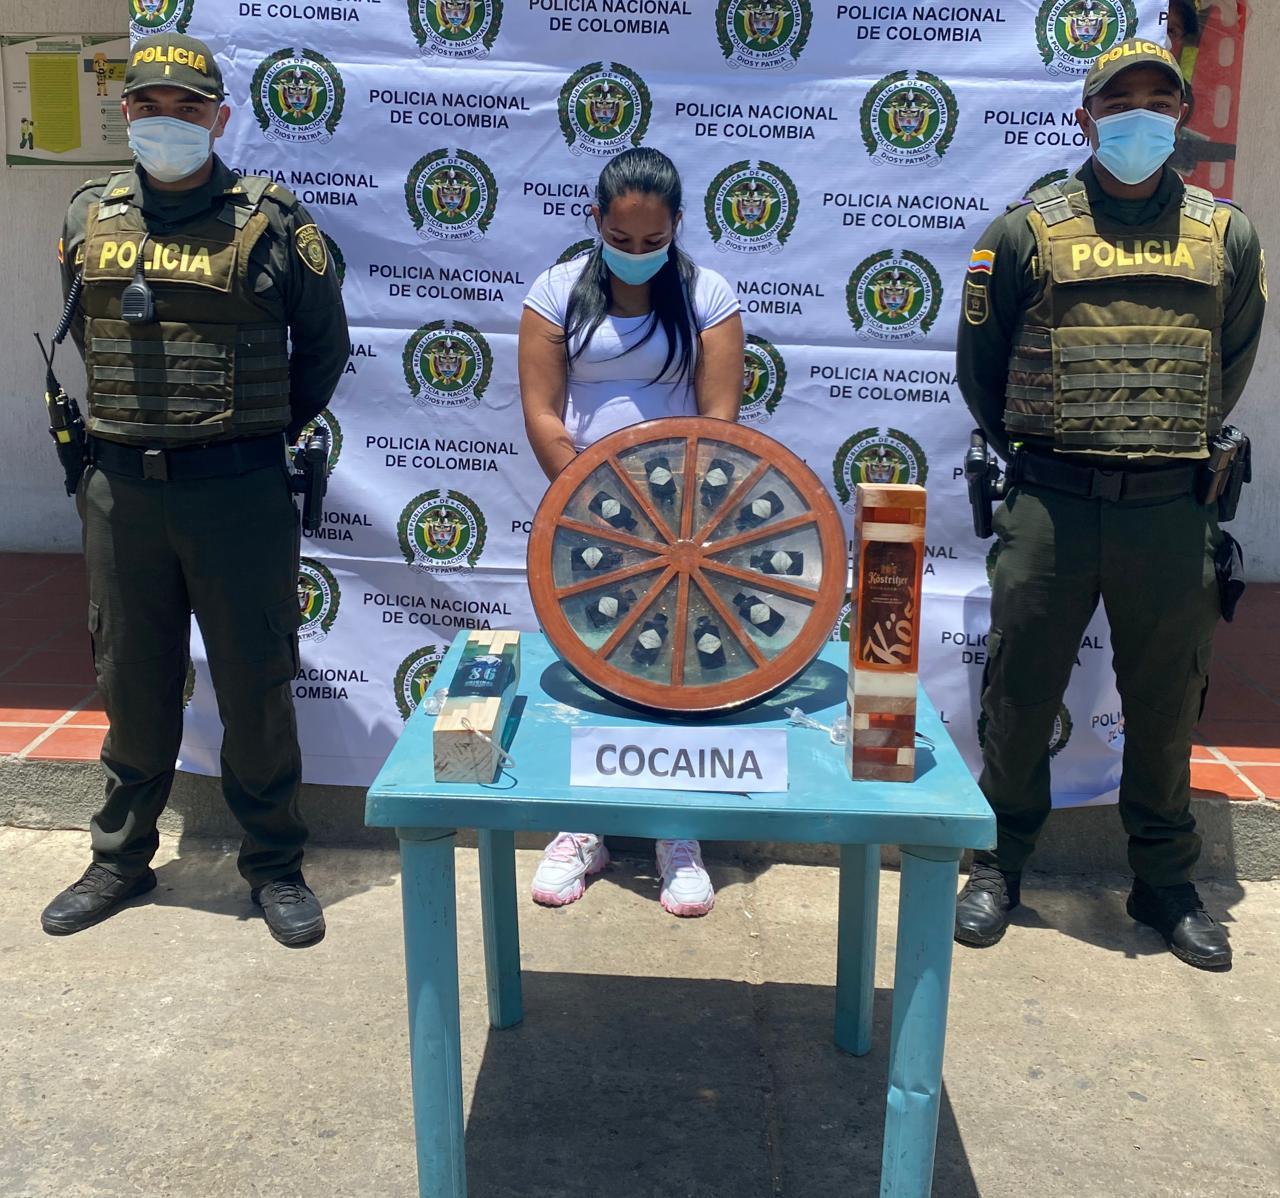 hoyennoticia.com, Mujer en Maicao cayó con cocaína liquida